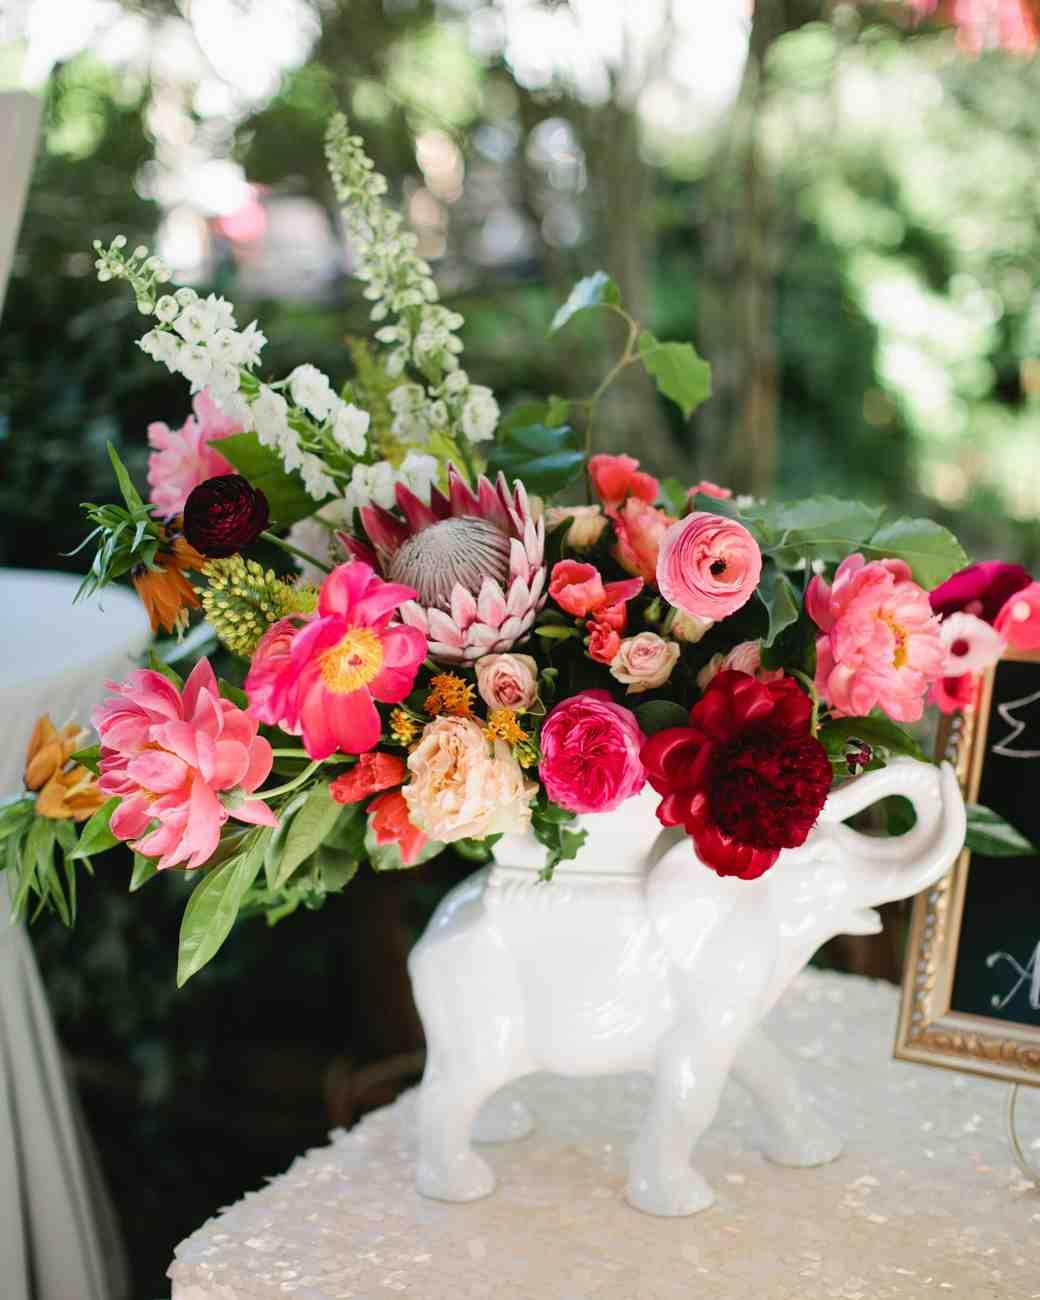 holly-john-wedding-texas-flowers-081-s112833-0516.jpg